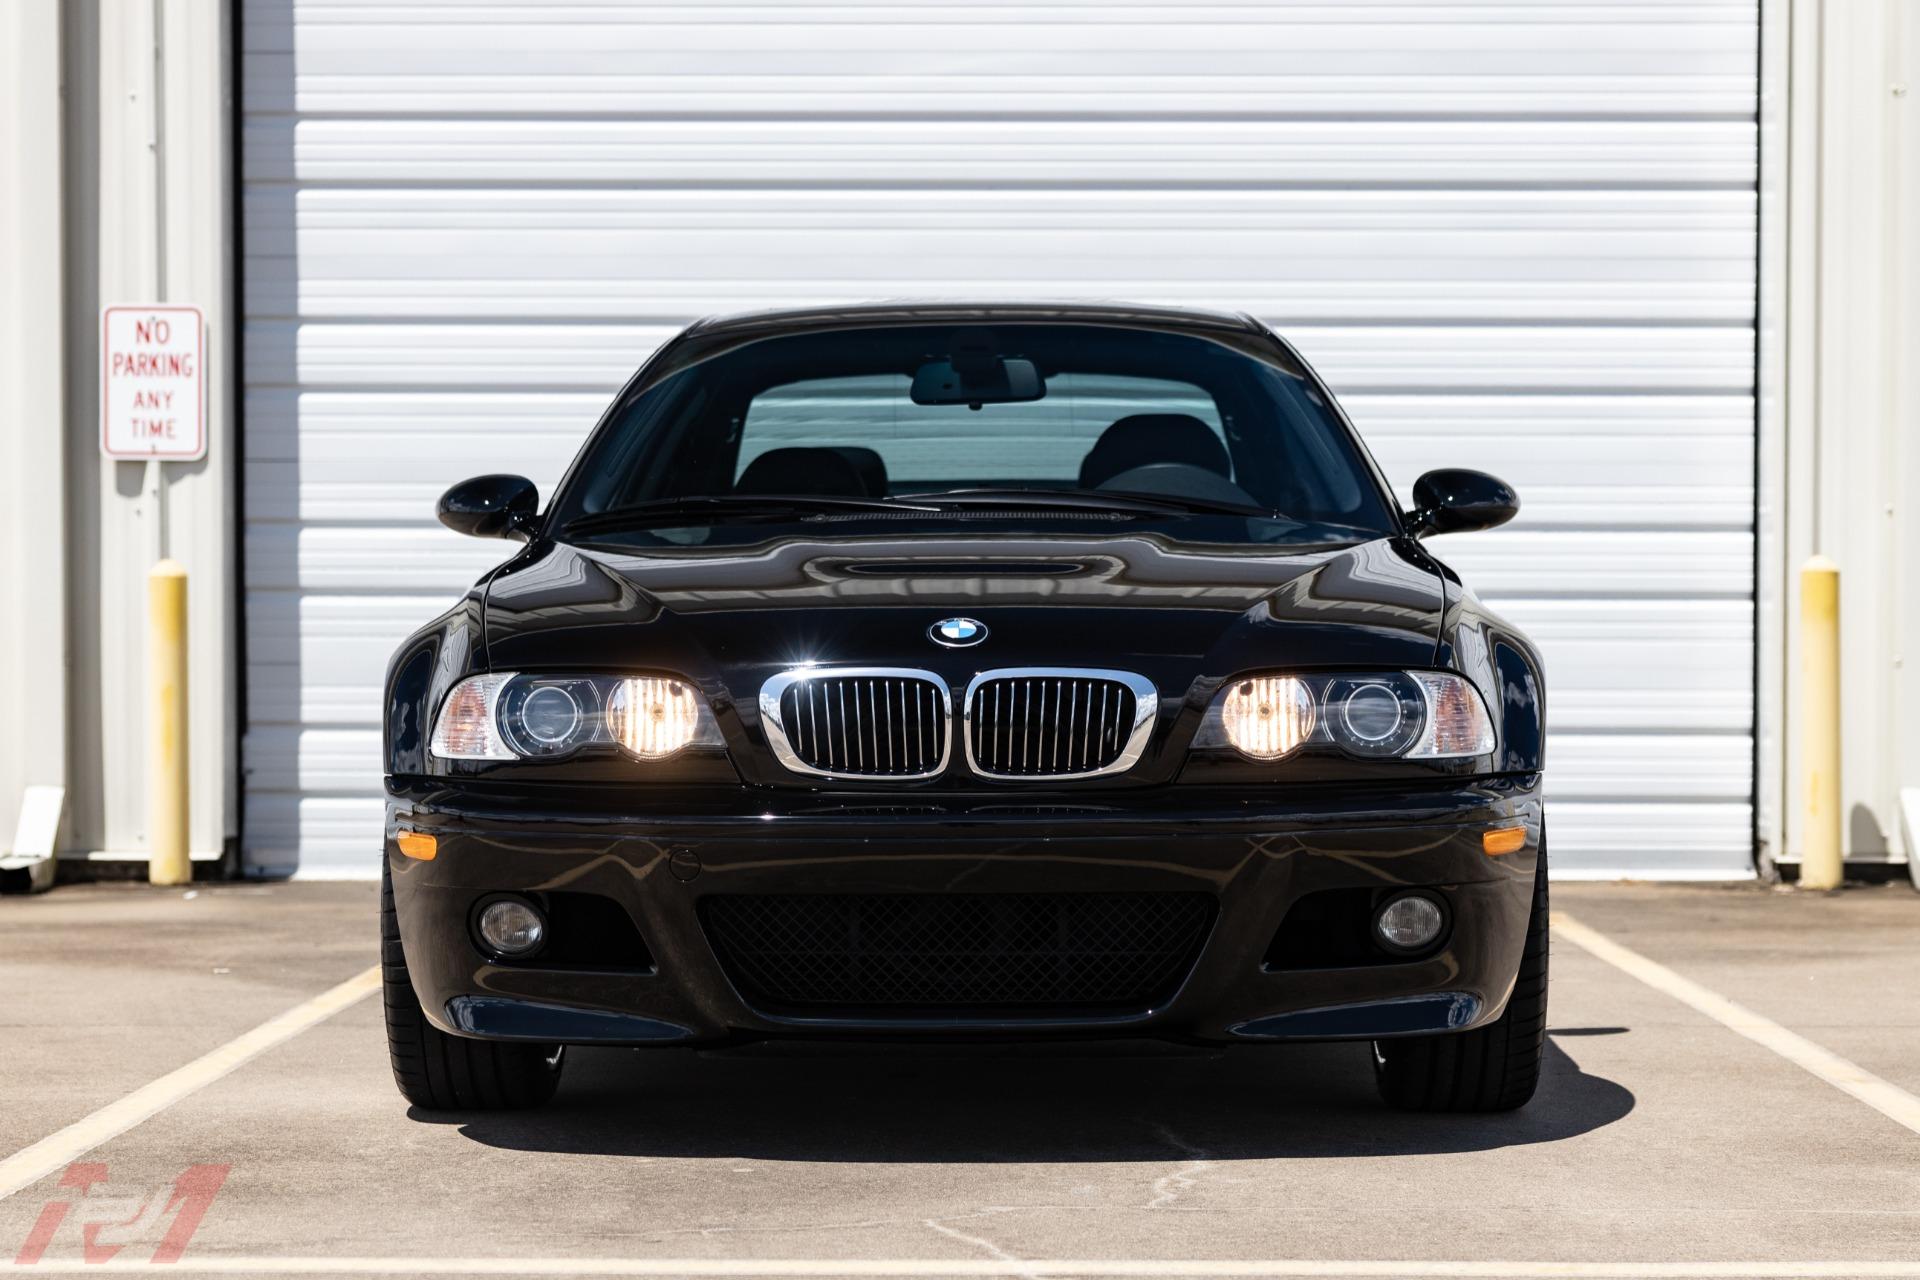 Used-2005-BMW-M3-6-speed